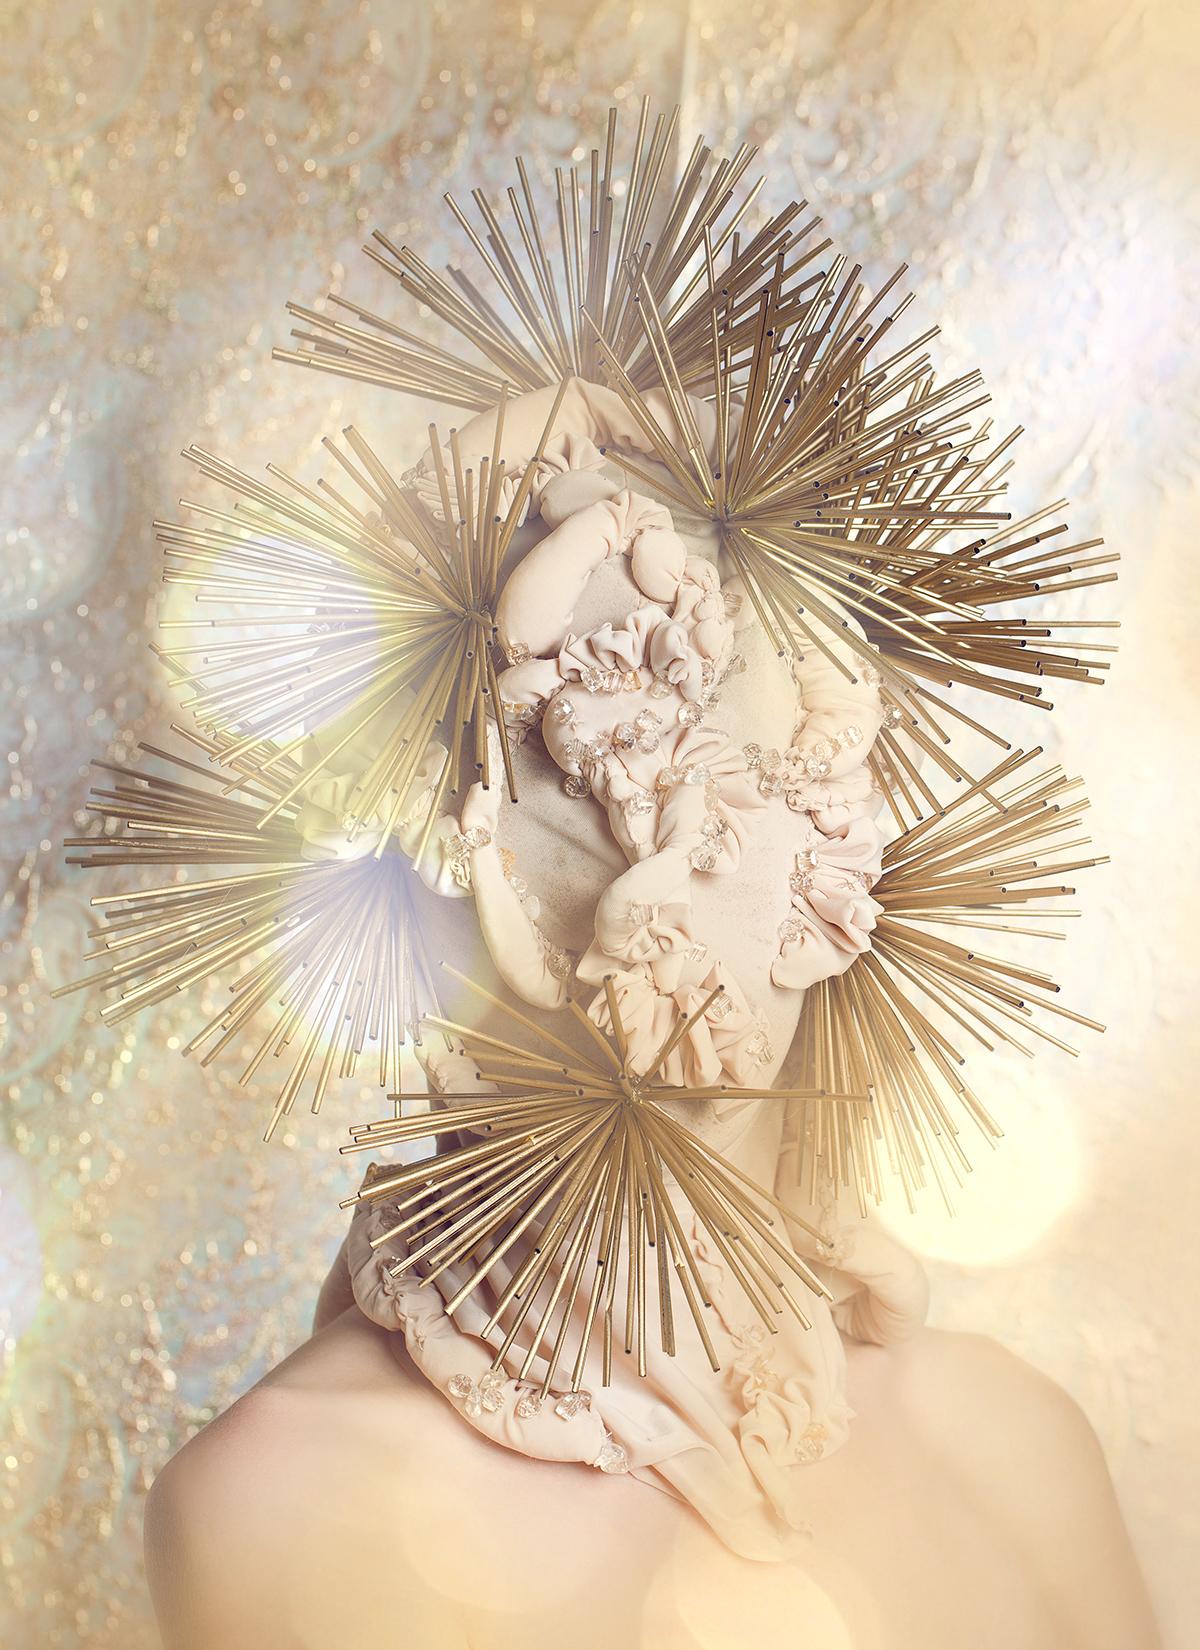 E-Jane - Meisha Kingdon - hair Heather Thomson - makeup Tamara Locke - designer Straight-Laced Boutique